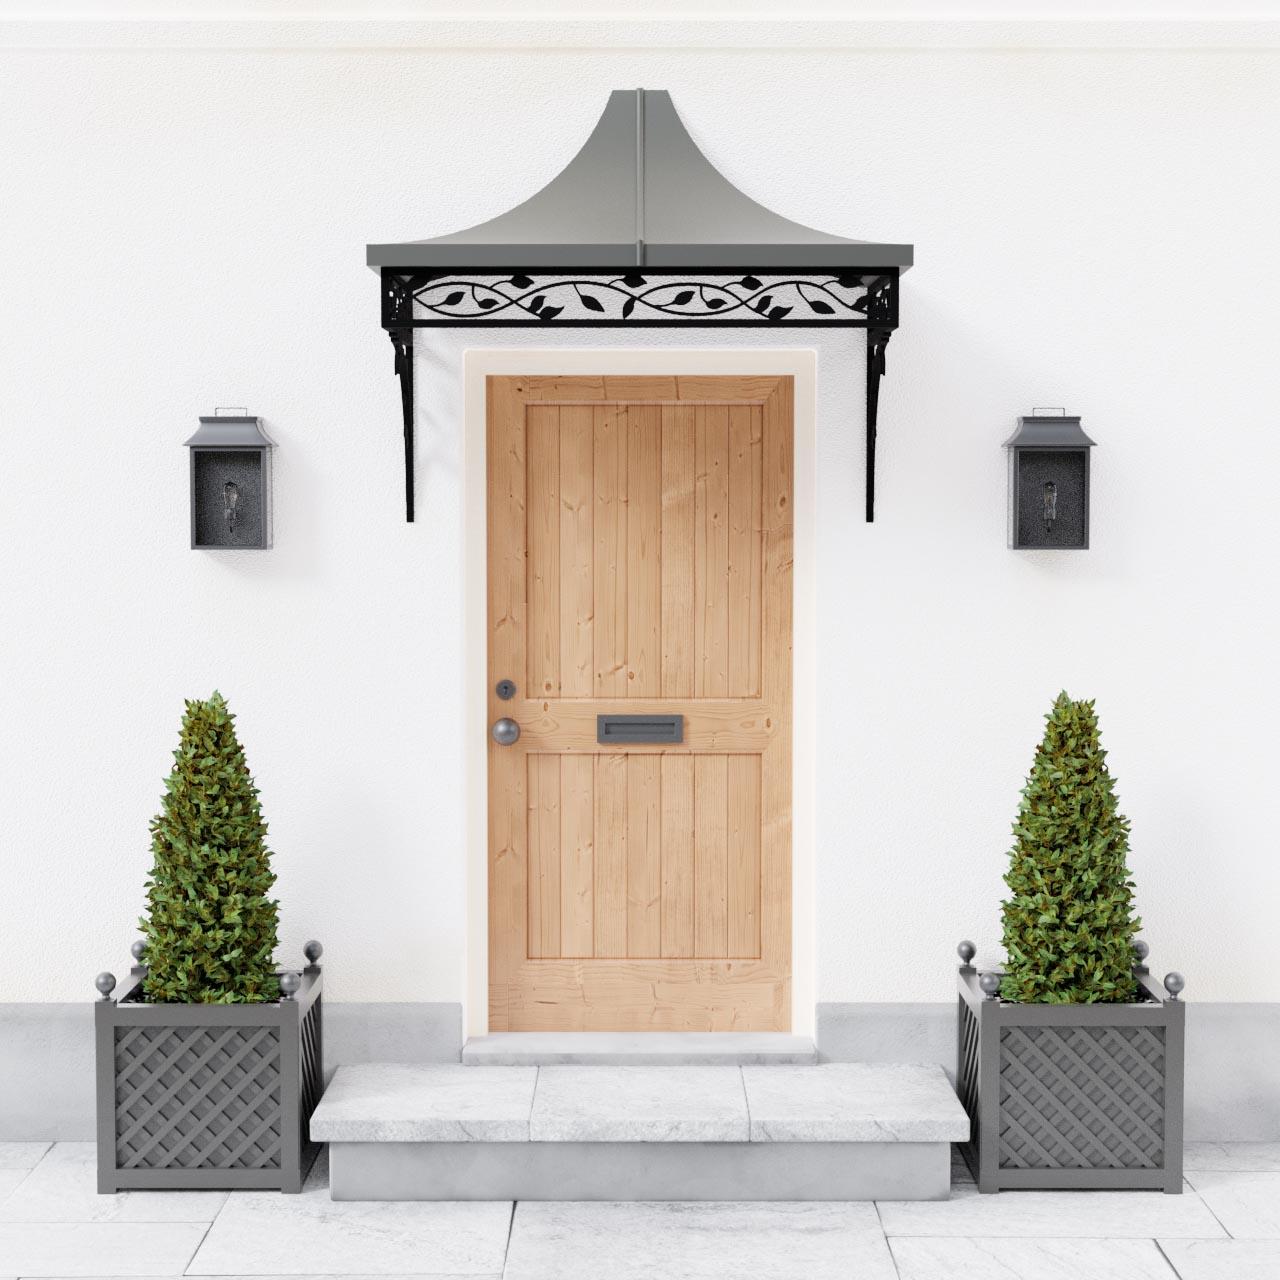 Roseleaf Metal Entrance Door Canopy